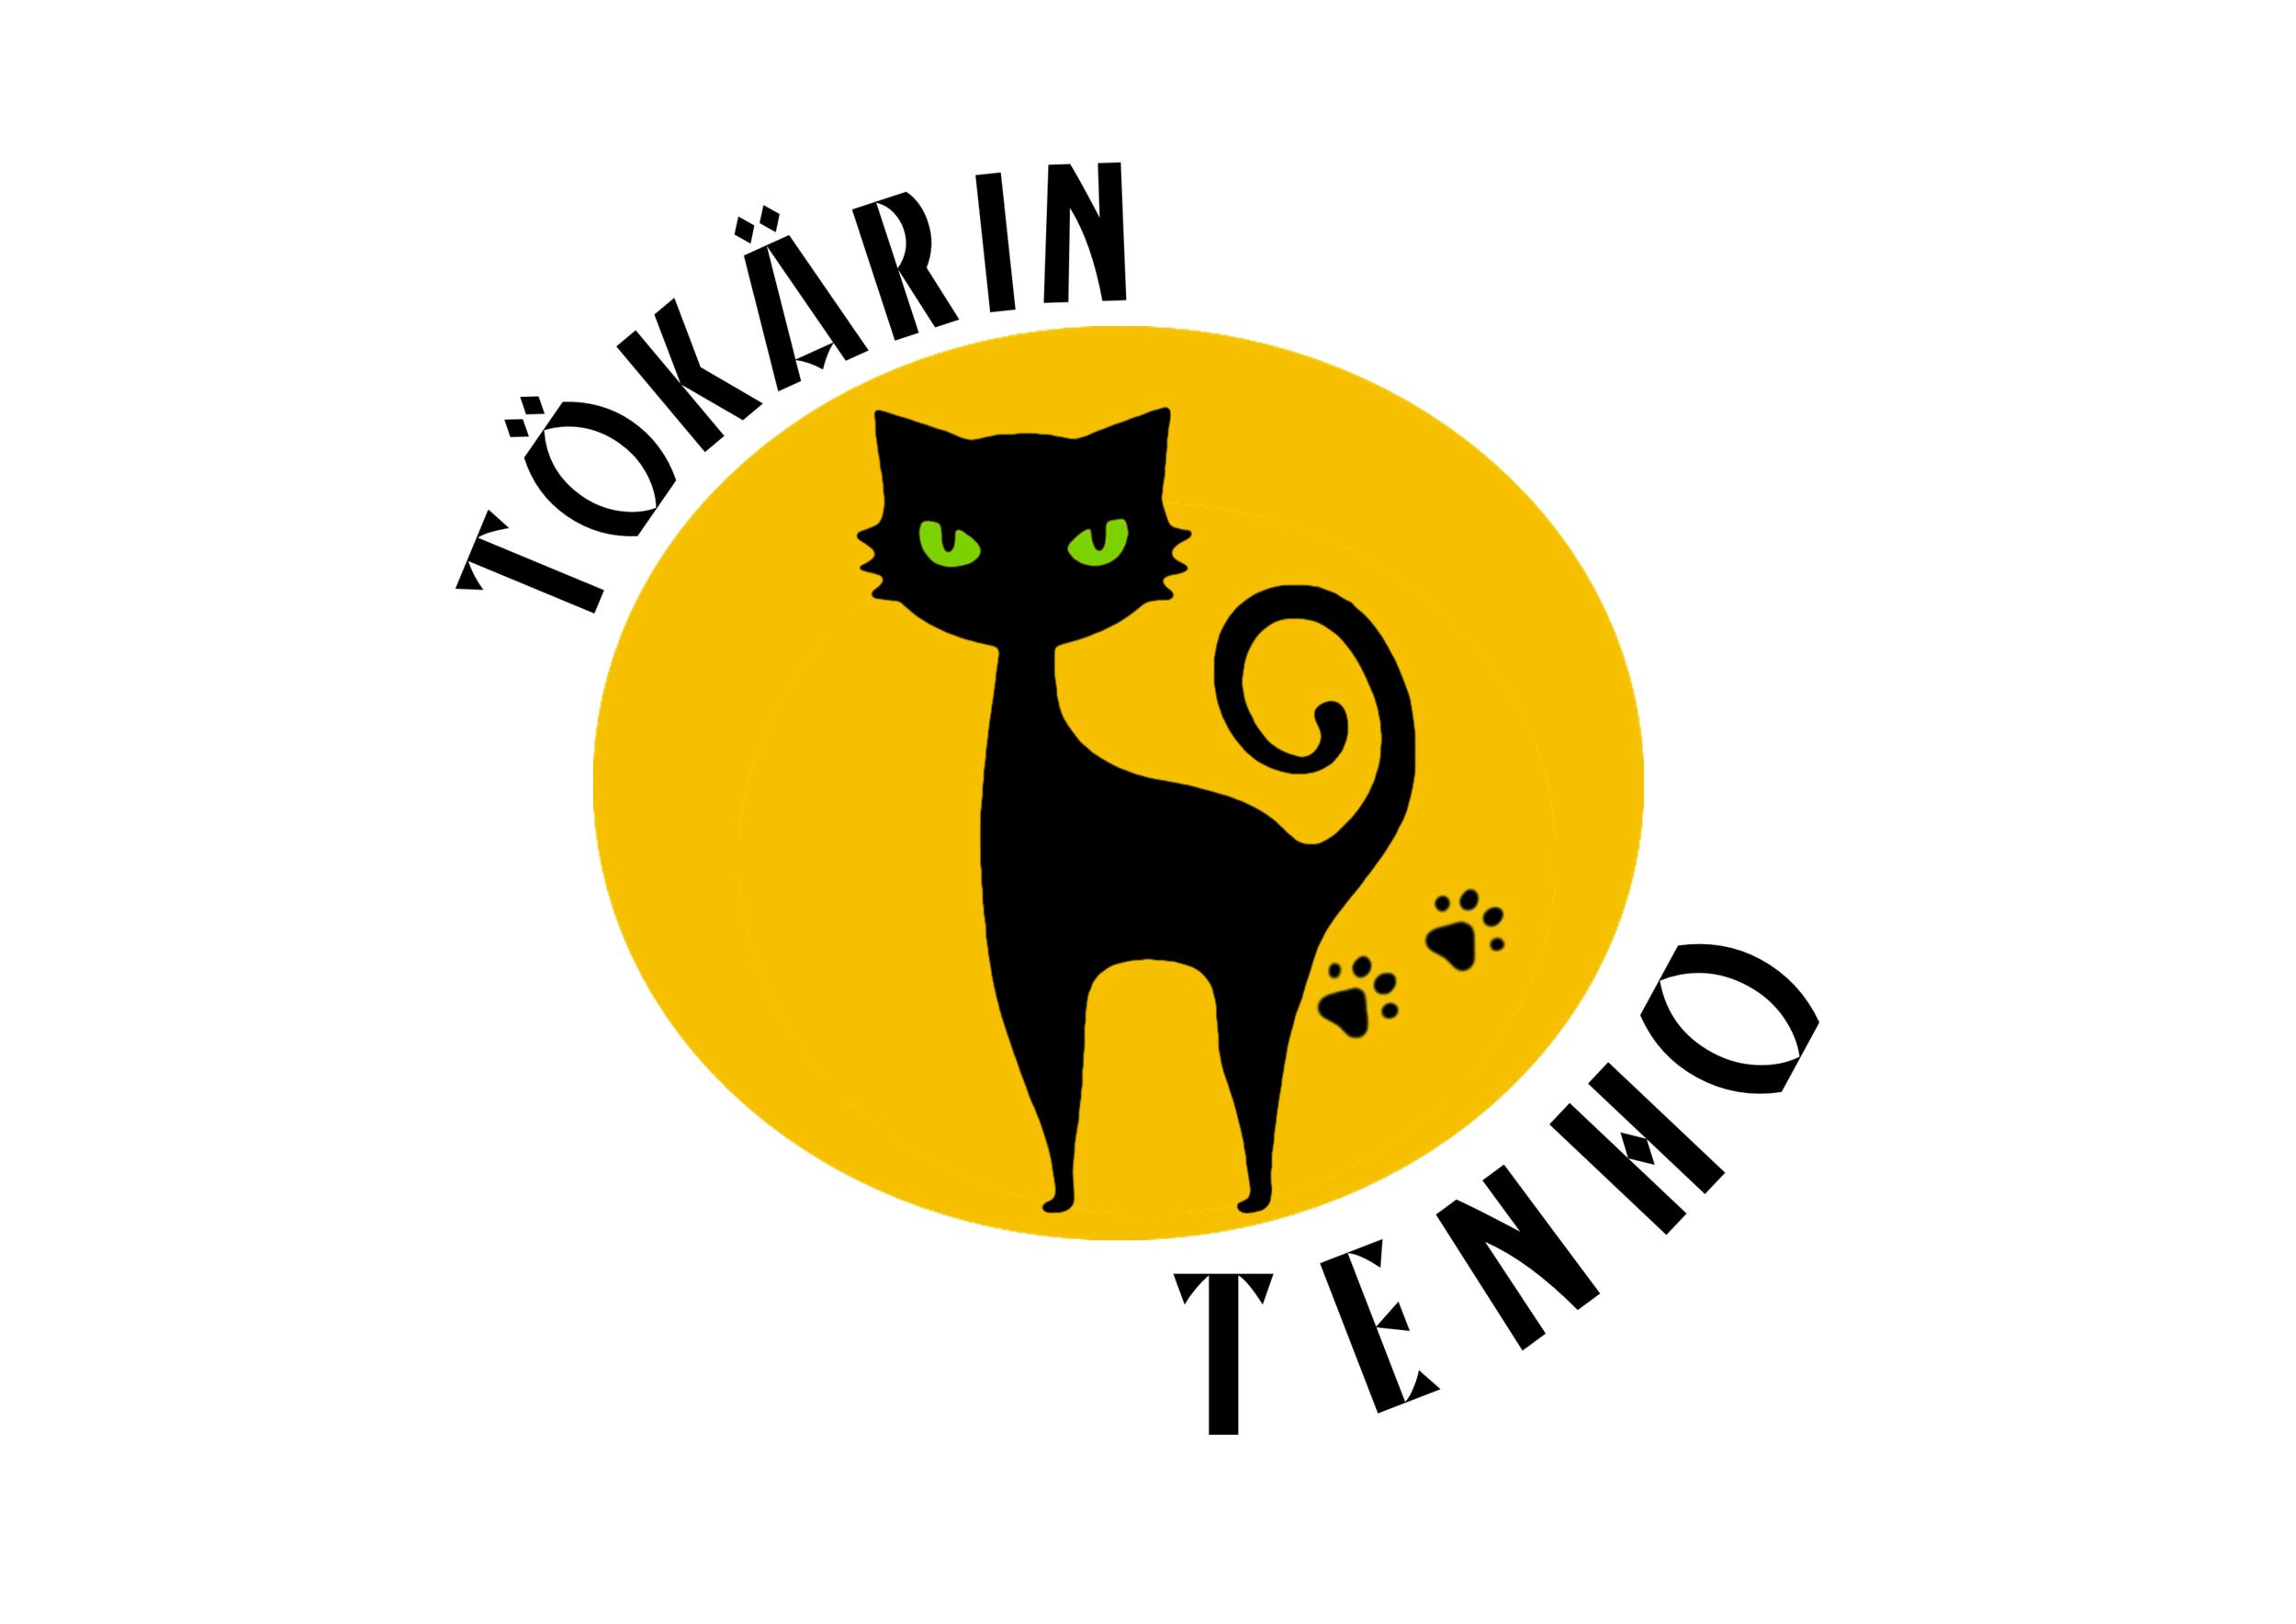 Tökärin tenho logo_mainokseen_valko.png